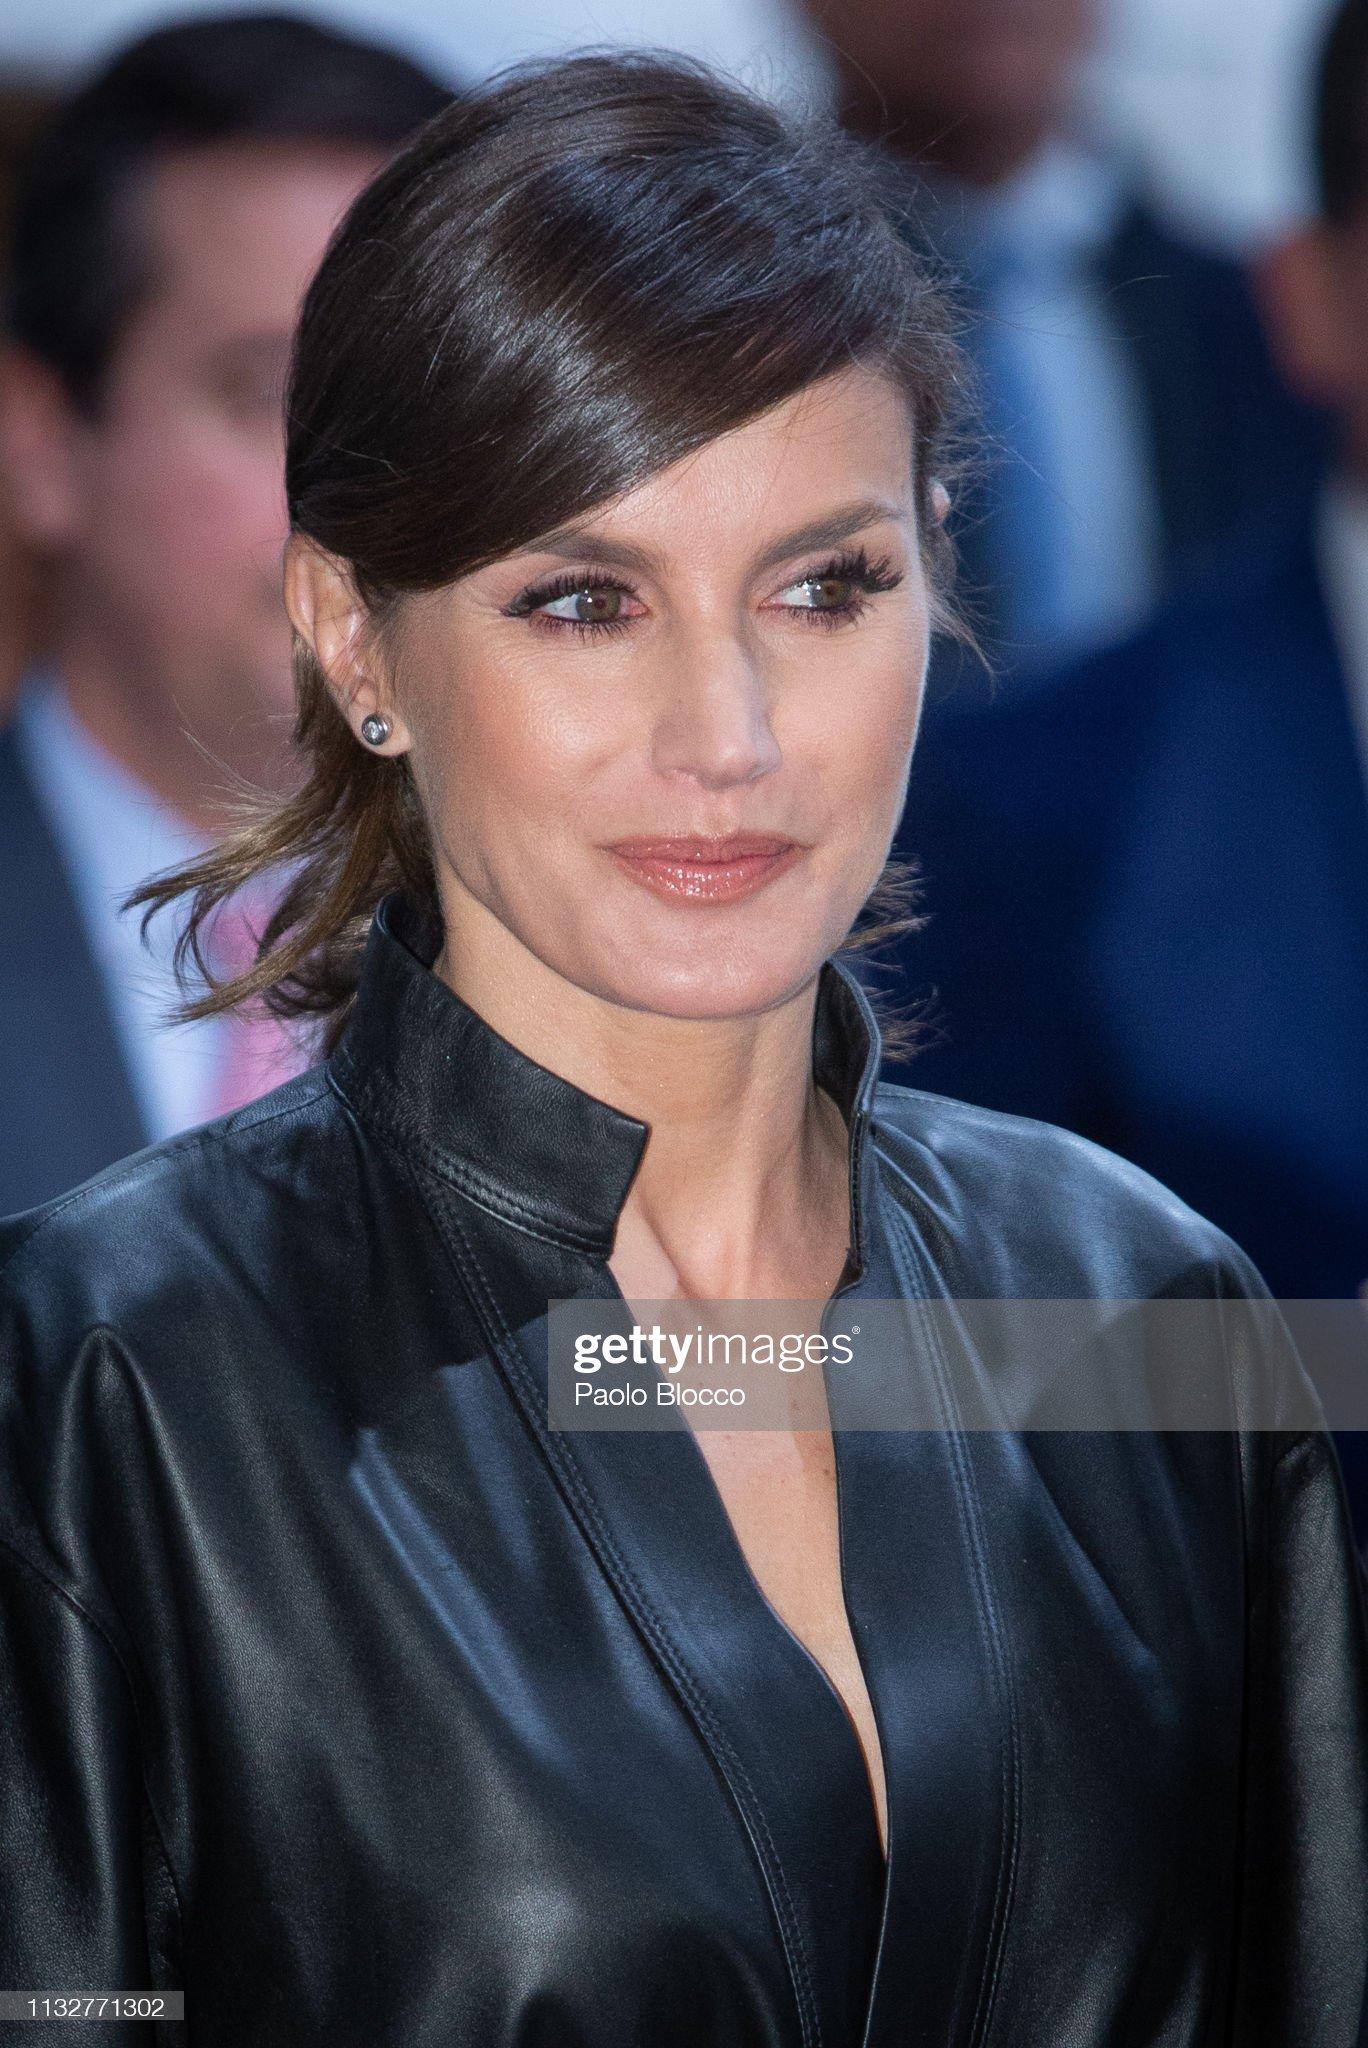 Spanish Royals Attend ARCO Art Fair 2019 : News Photo